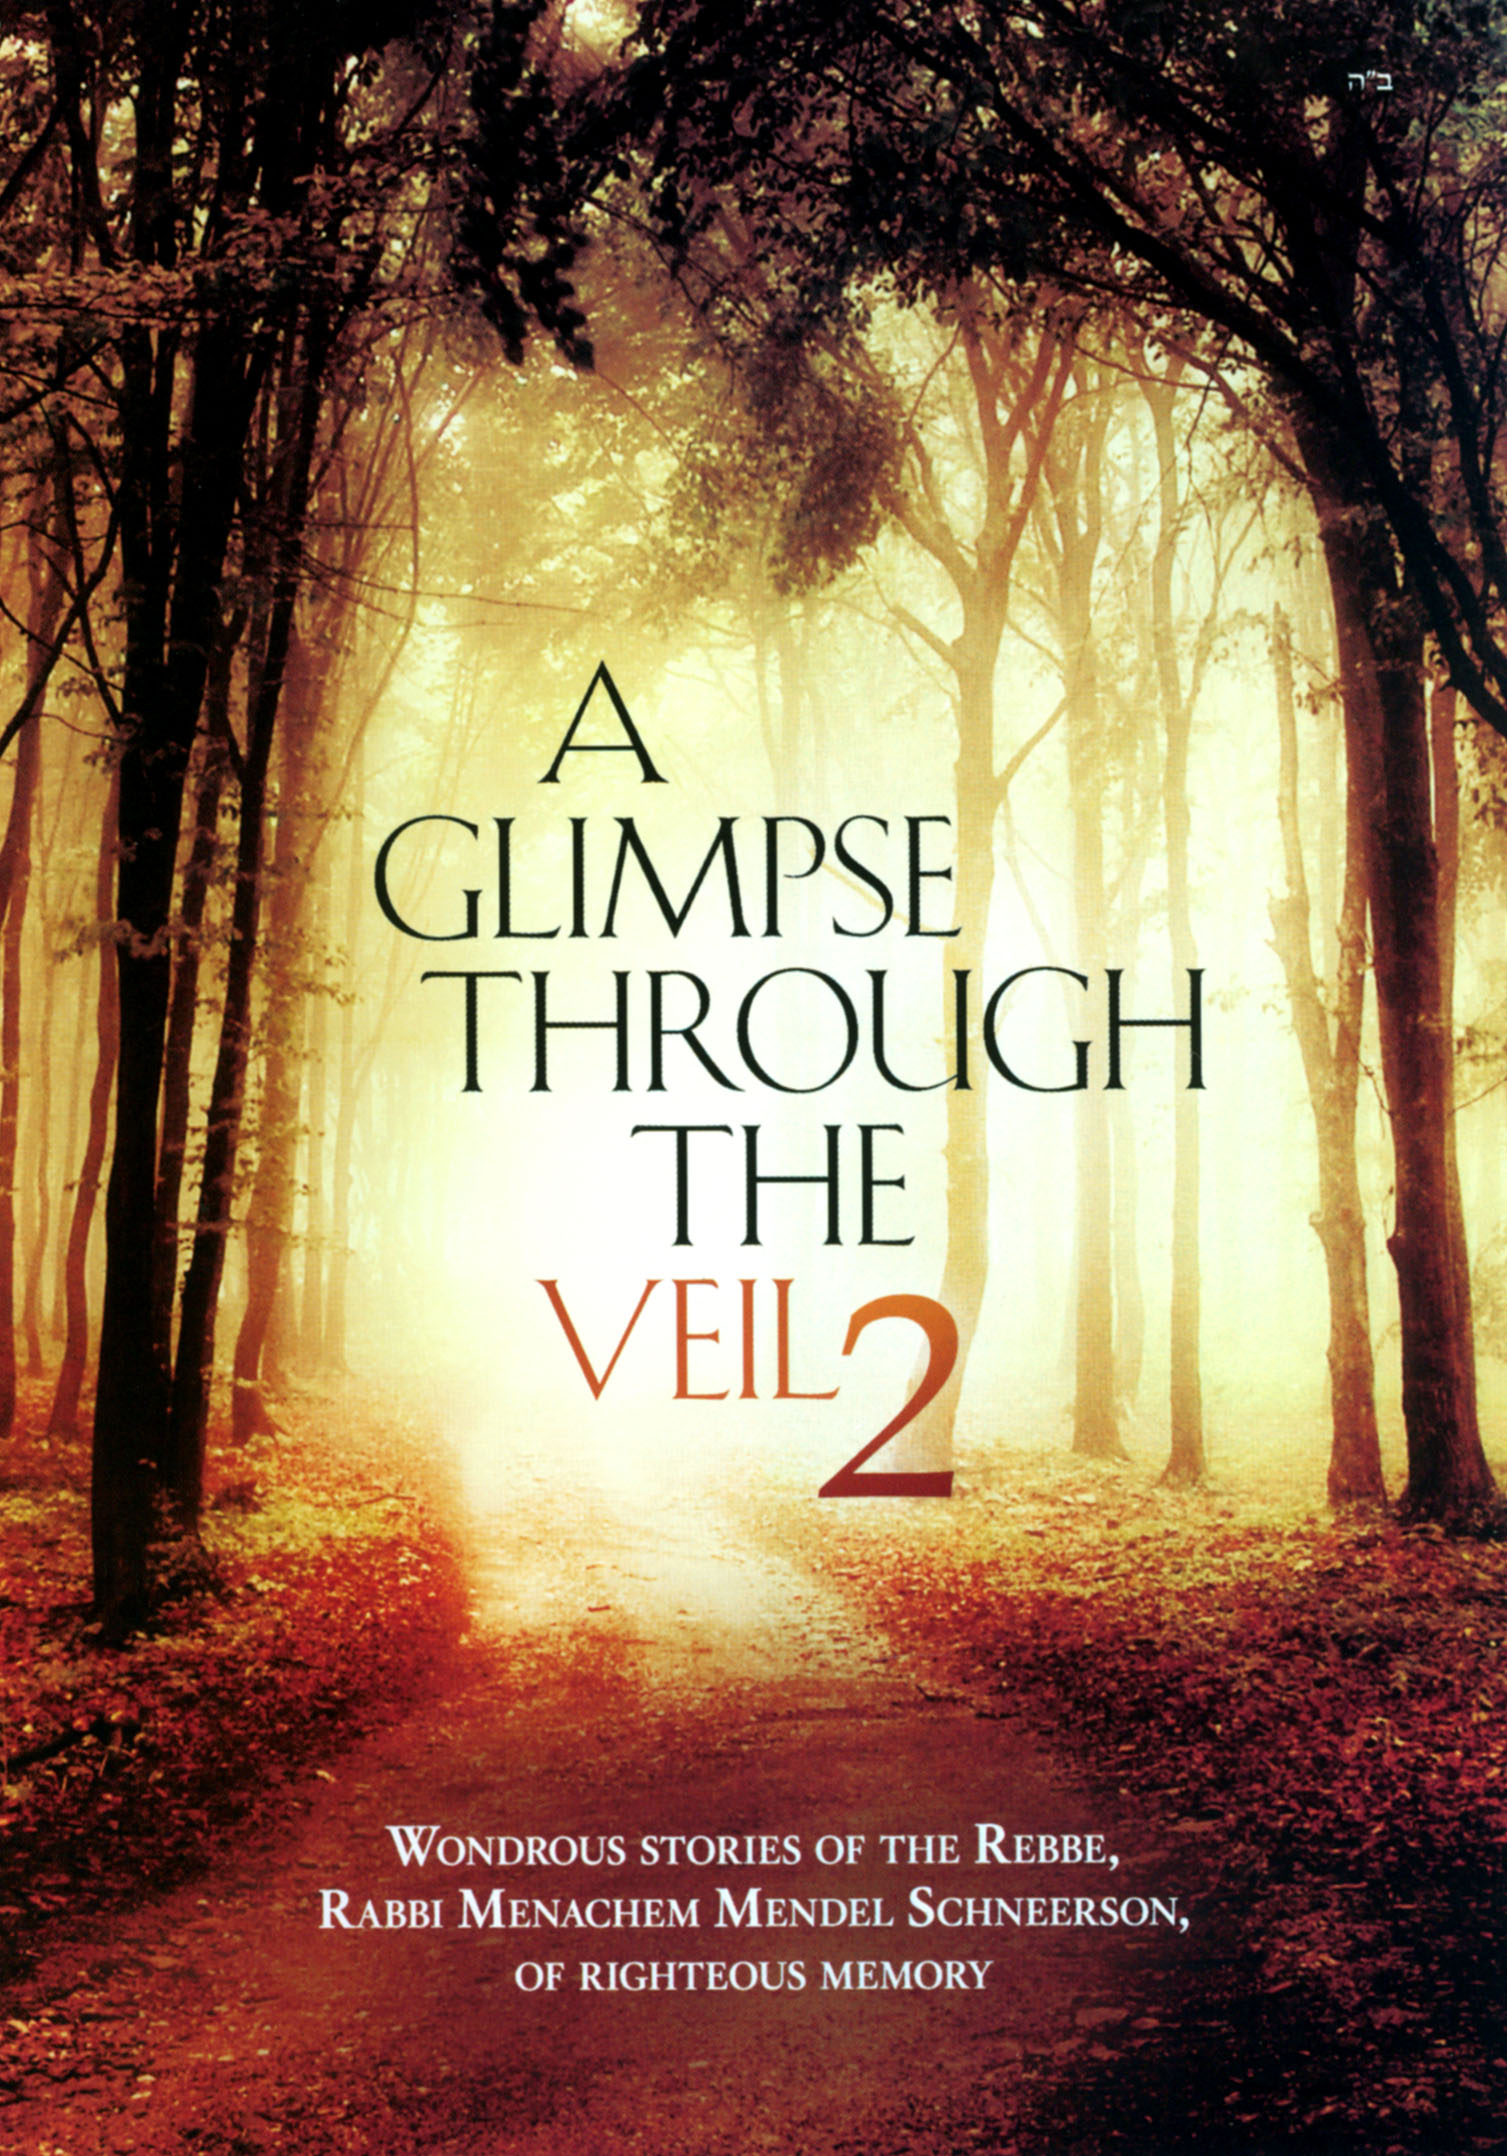 A Glimpse Through the Veil 2